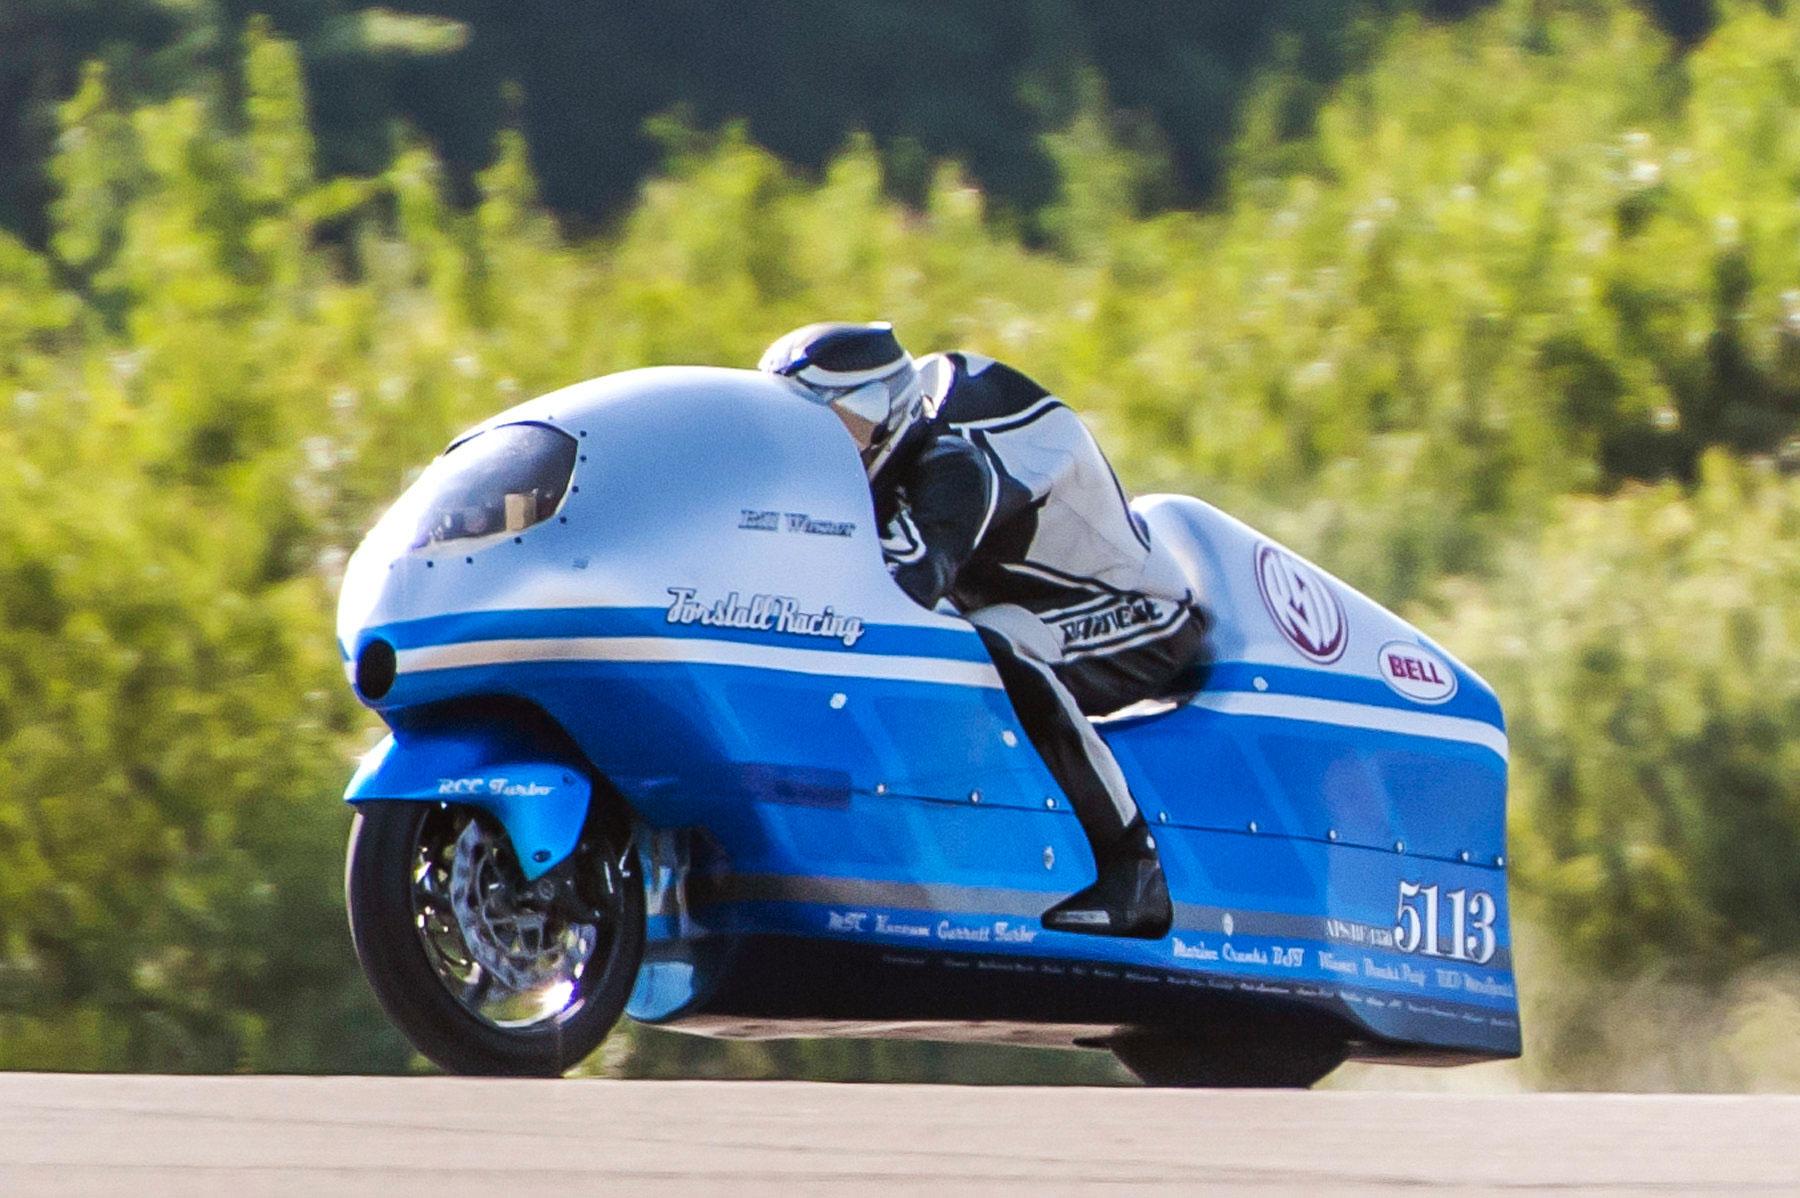 Bill Warner and his 1000 hp Suzuki Hayabusa on a runway speed strip